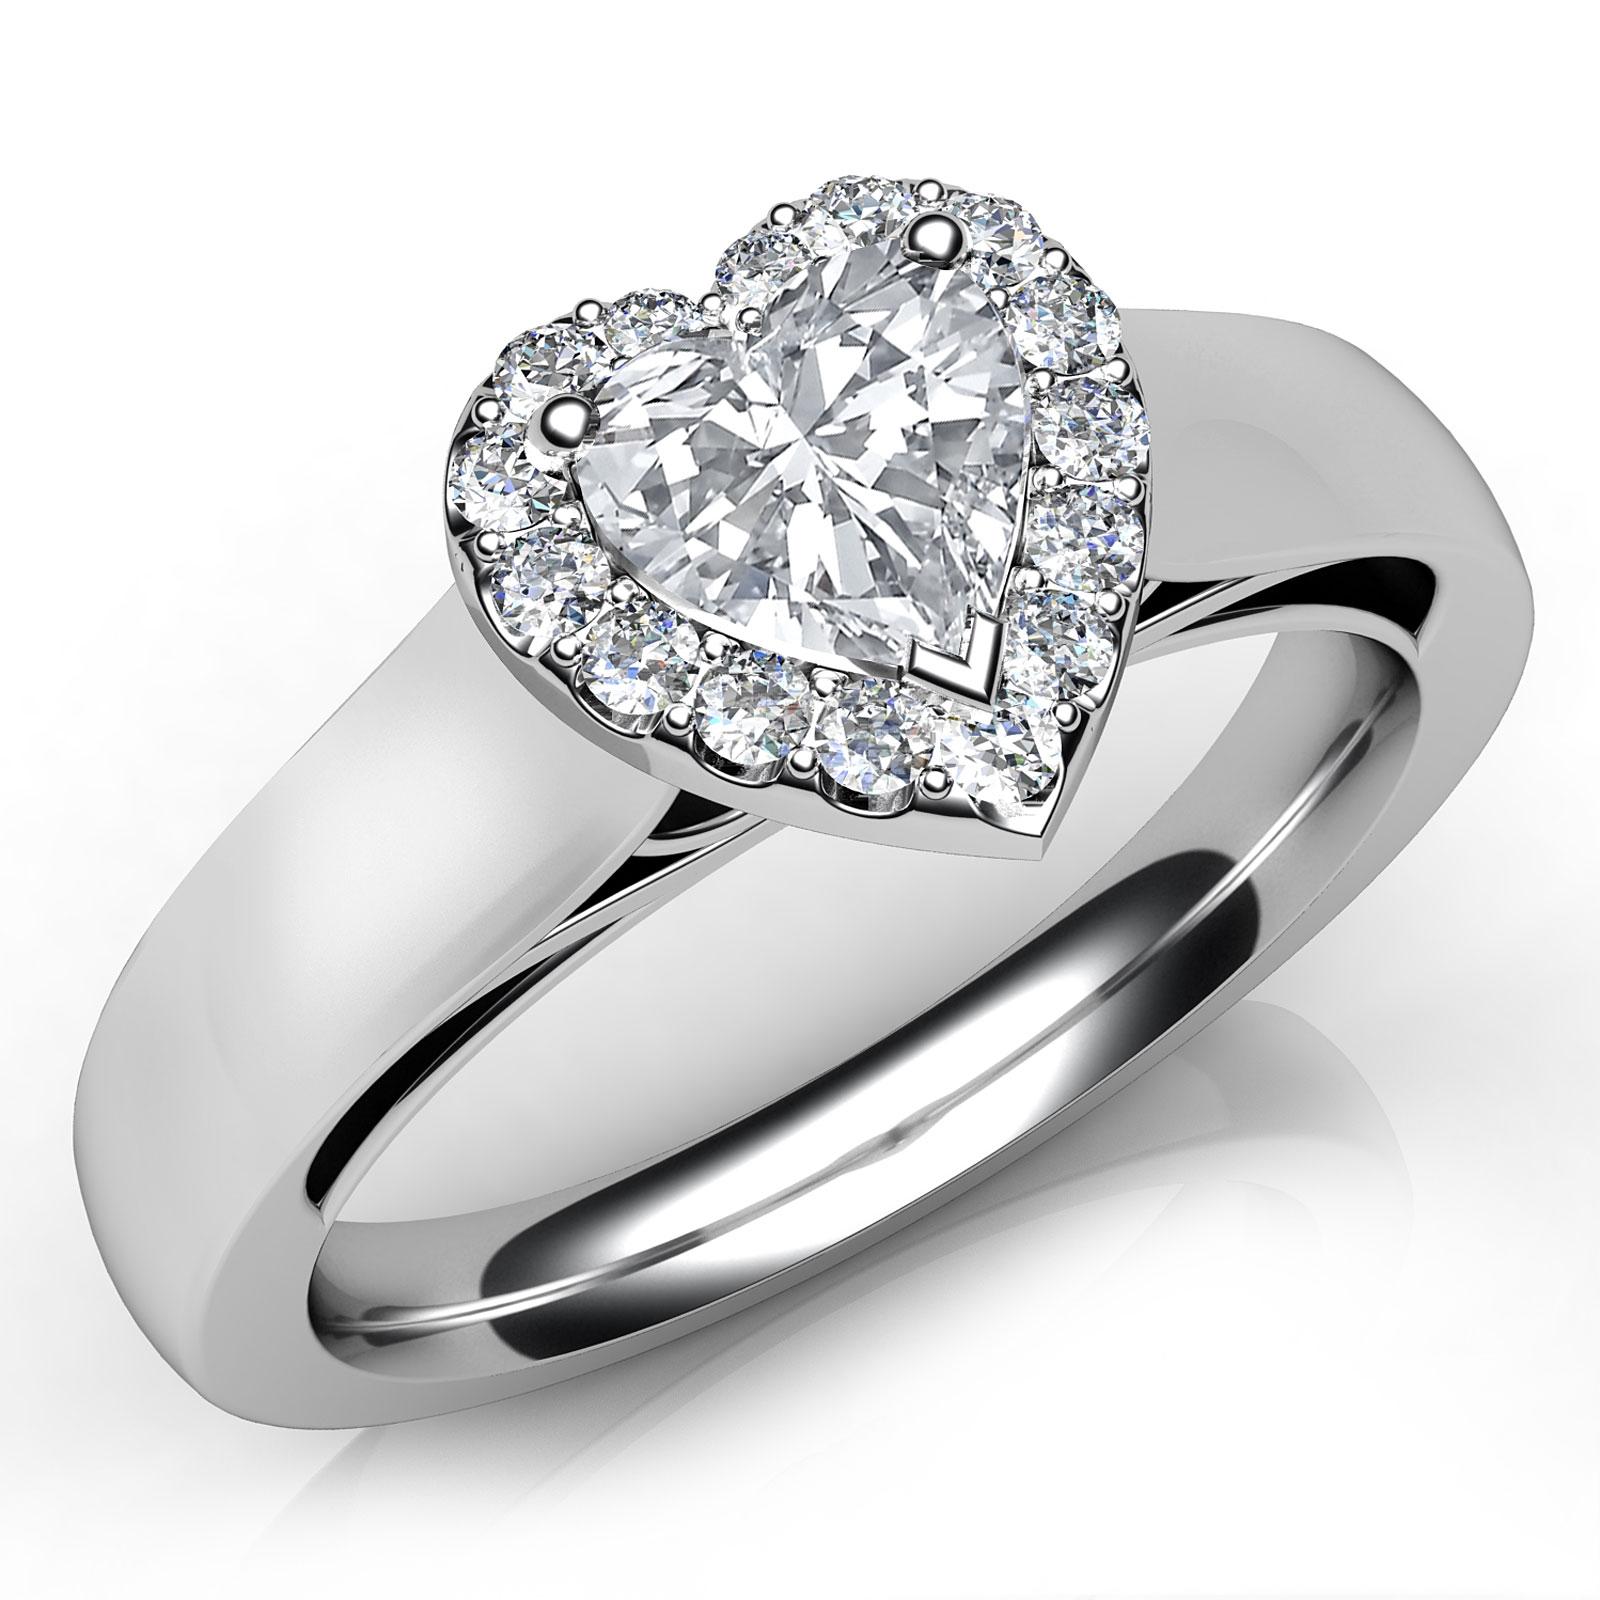 Colored Diamond Wedding Ring Sets: Heart Shape Halo Pave Set Diamond Engagement Ring GIA G